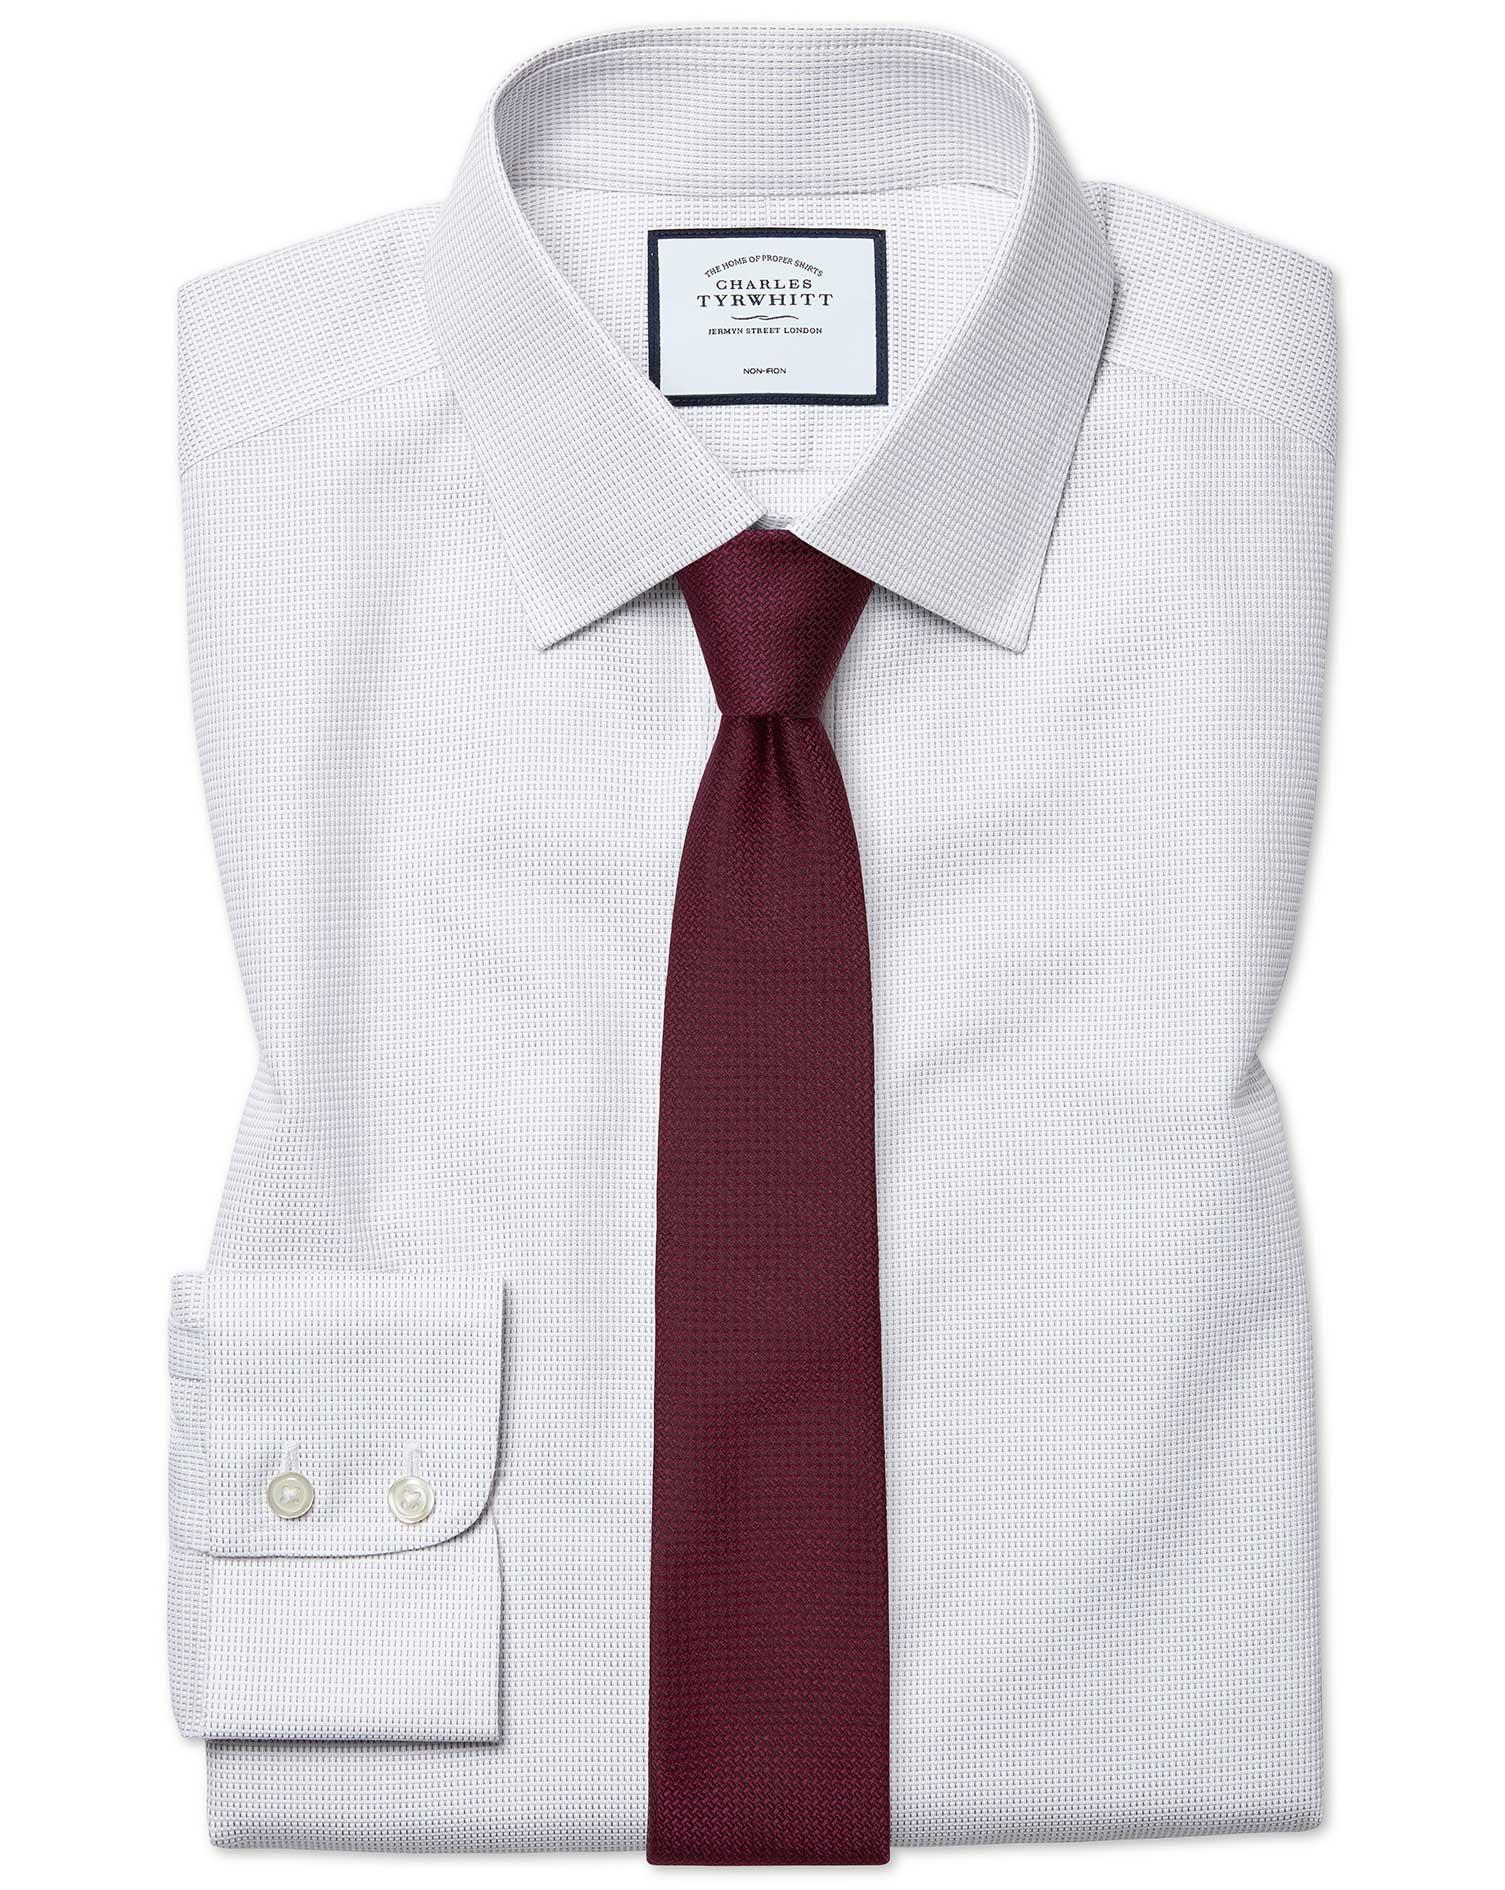 Cotton Extra Slim Fit Non-Iron Dash Weave Grey Shirt